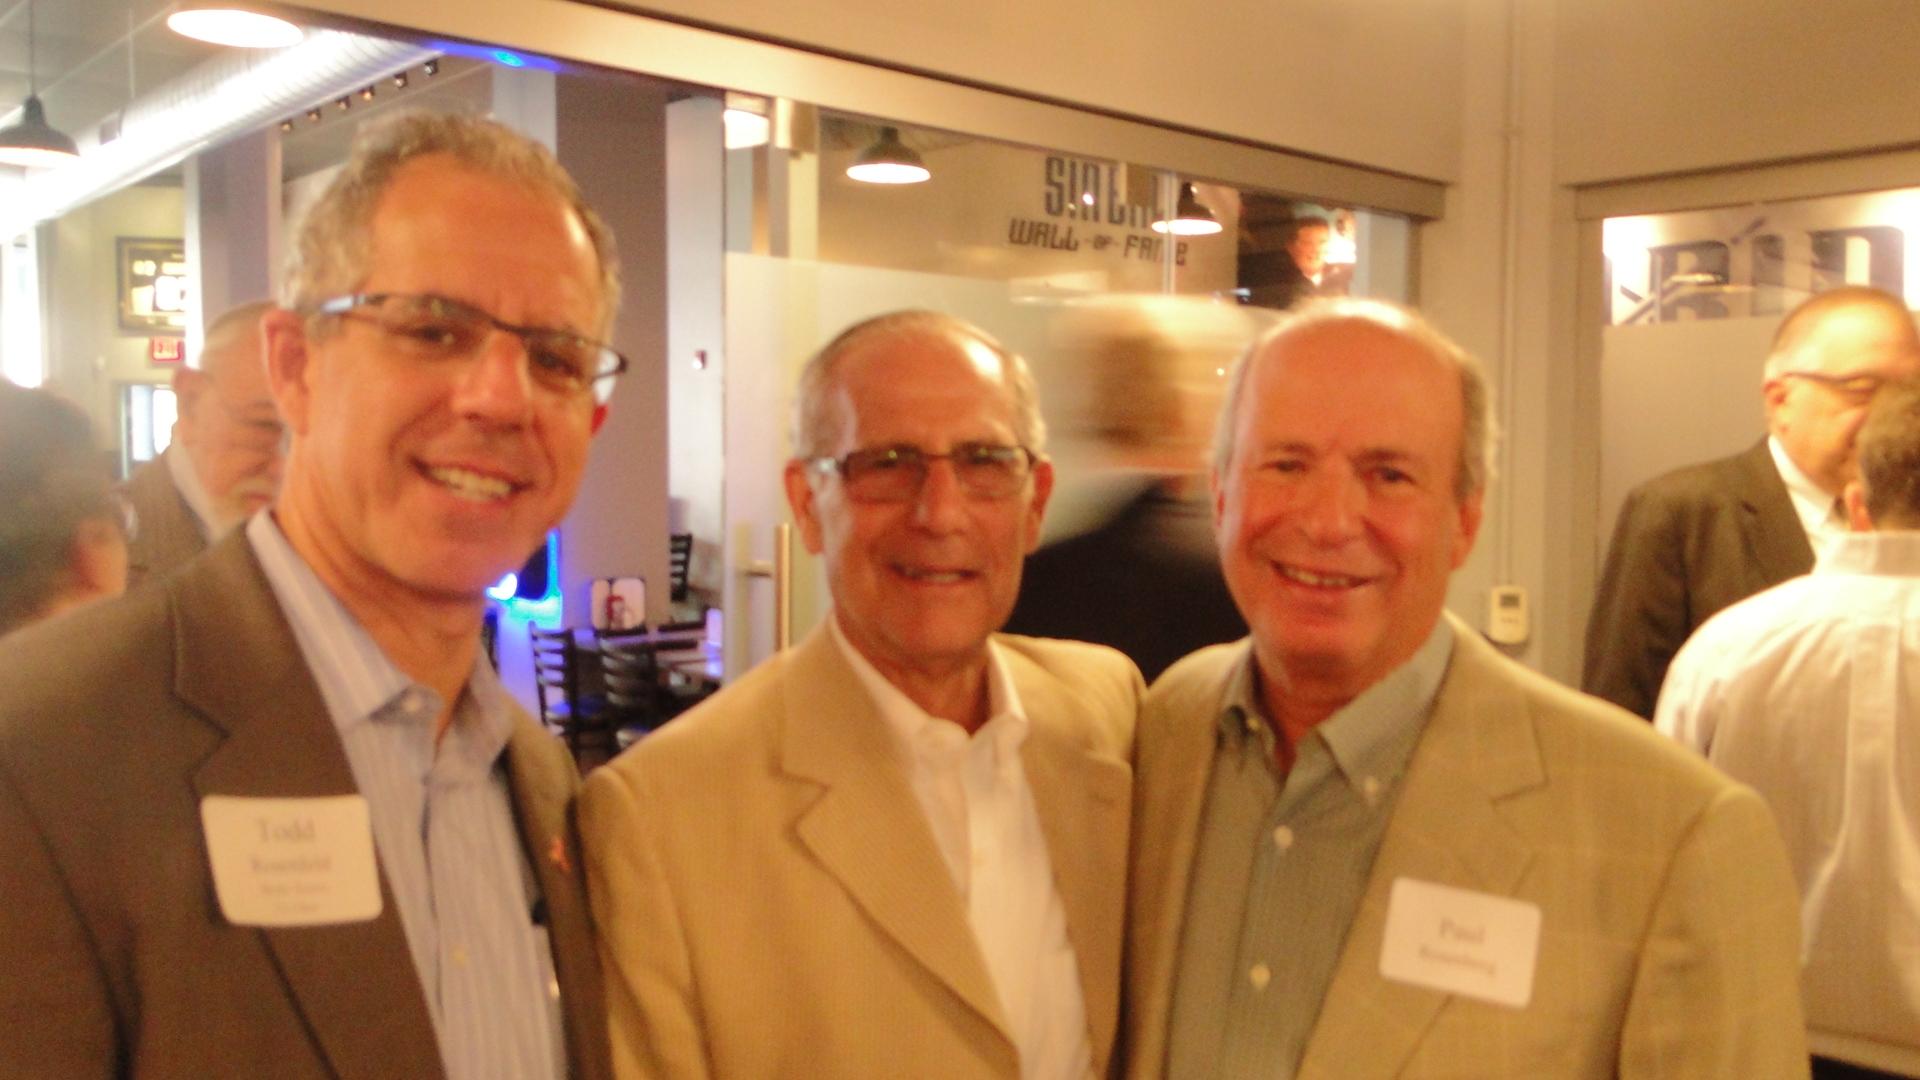 Todd Rosenfeld, David Steinbach, and Paul Rosenberg